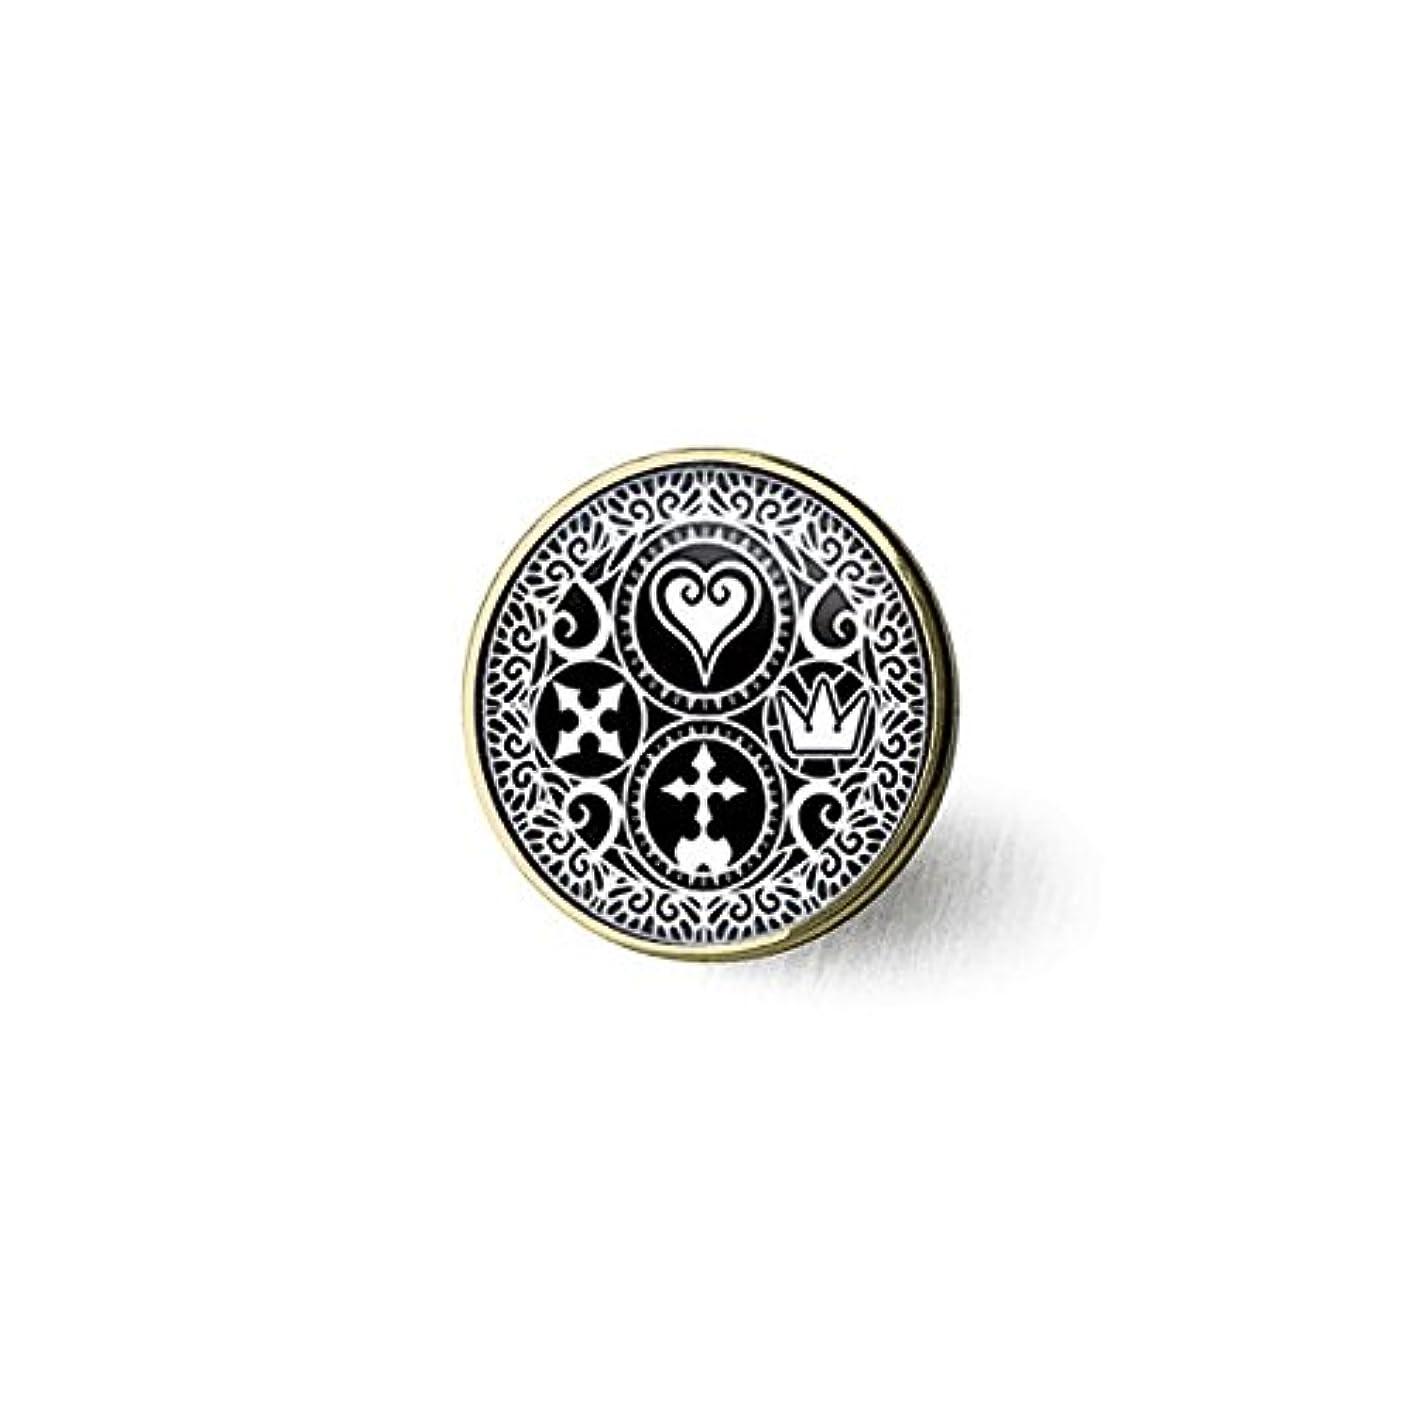 hars Handmade Kingdom Hearts Ultimania Trinity Emblem Brooch, Brooch Gift for Her Him, Nekel Free Jewelry